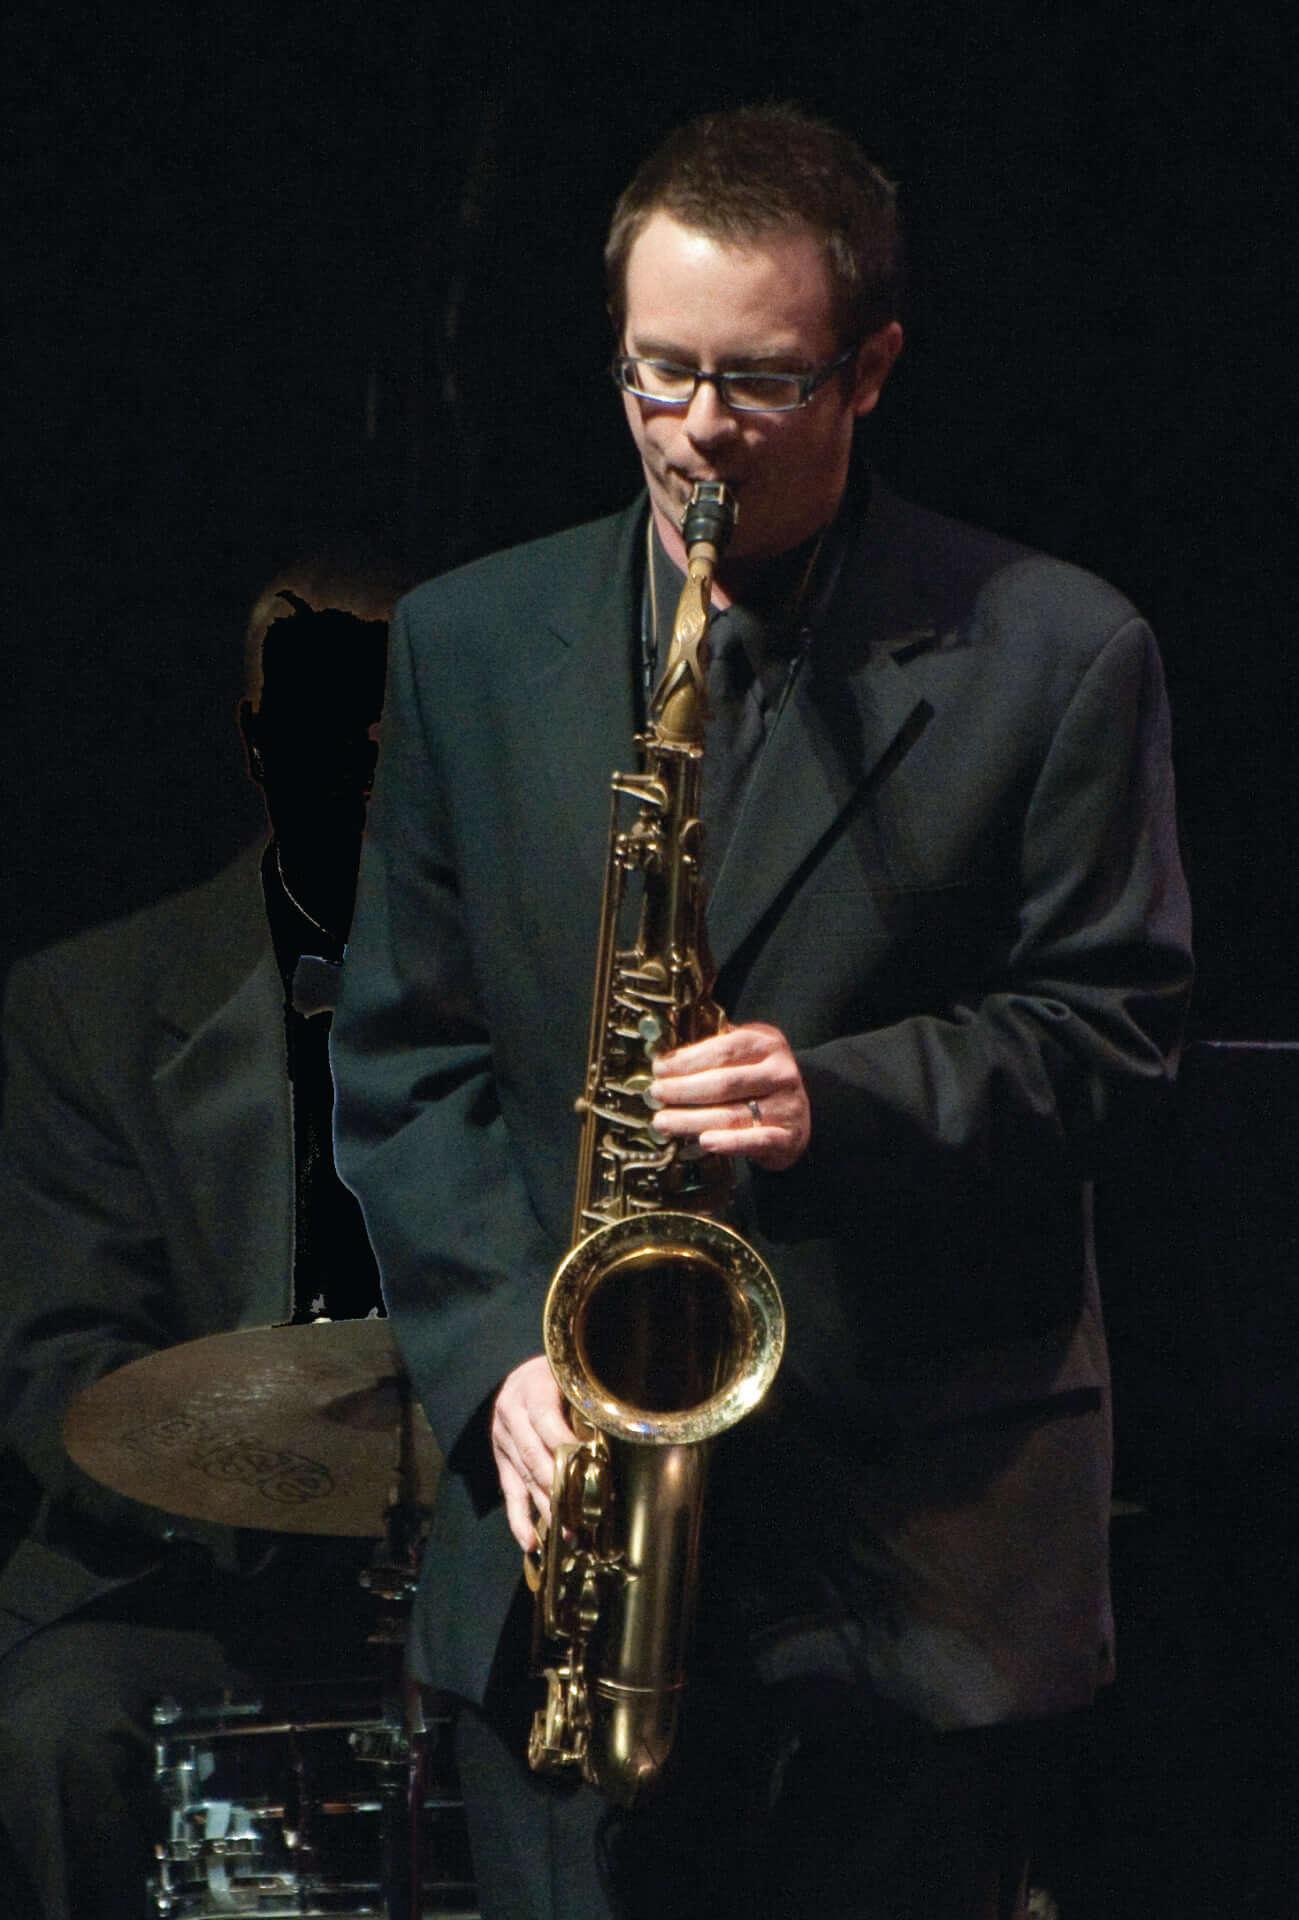 Dr. Kurtis Adams, director, School of Music